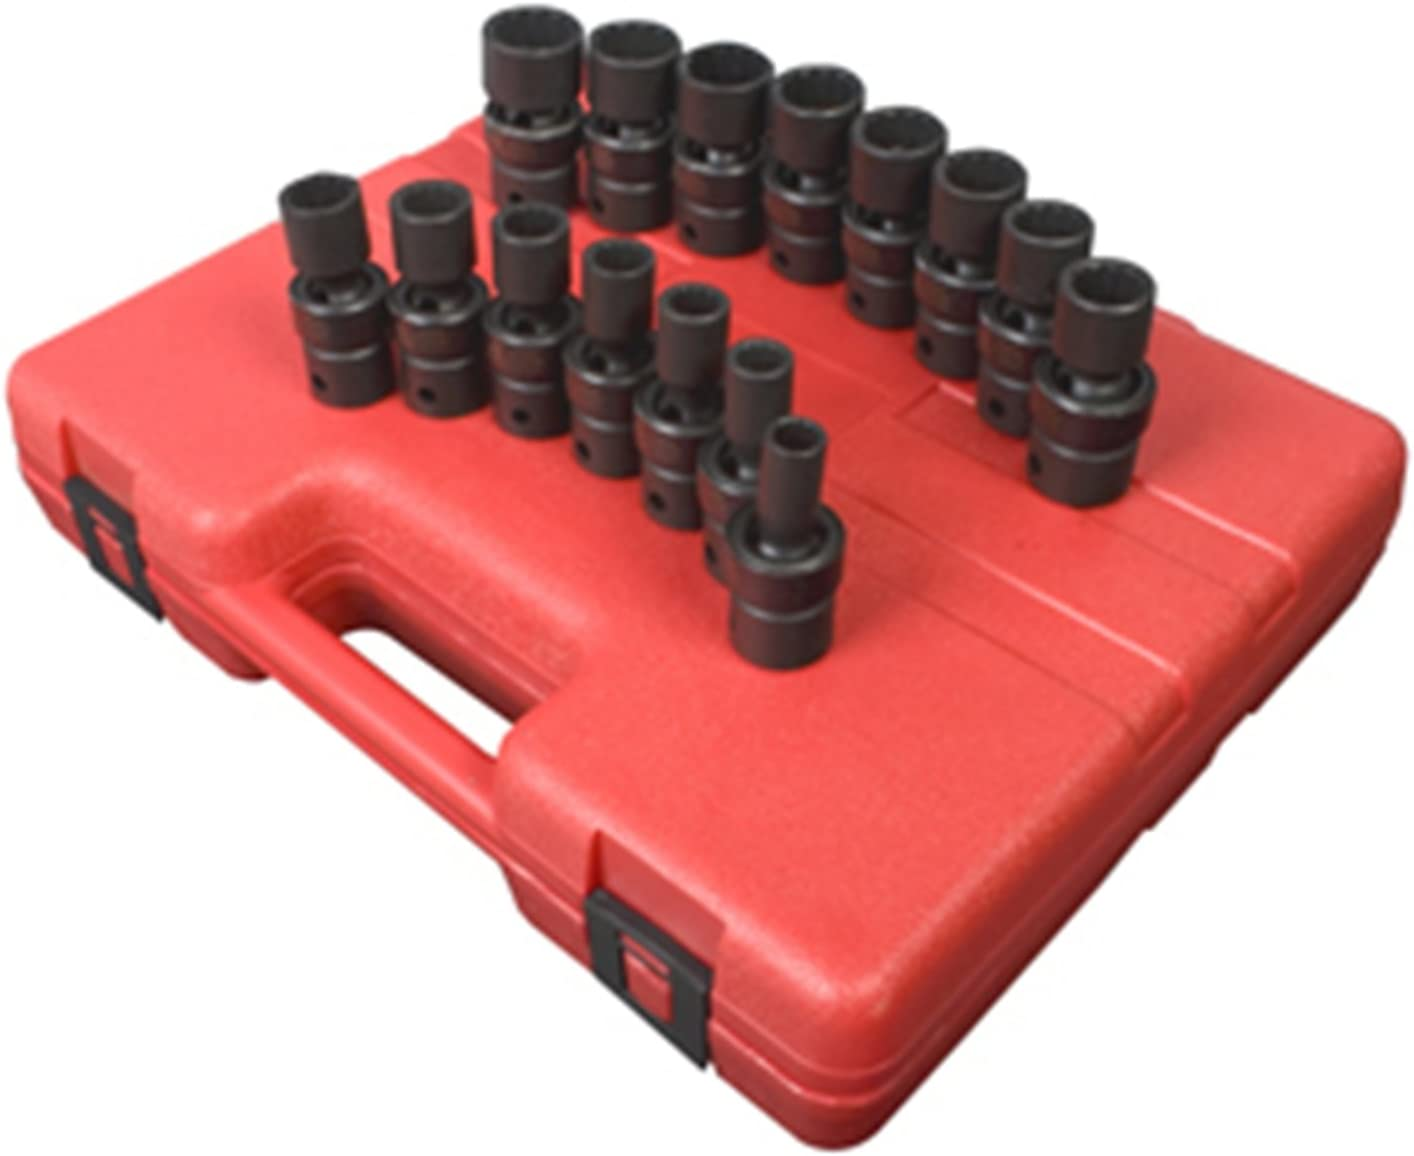 Sunex Tools 3691 13 Piece 3//8 Drive 12 Point Flex Impact Socket Set Metric